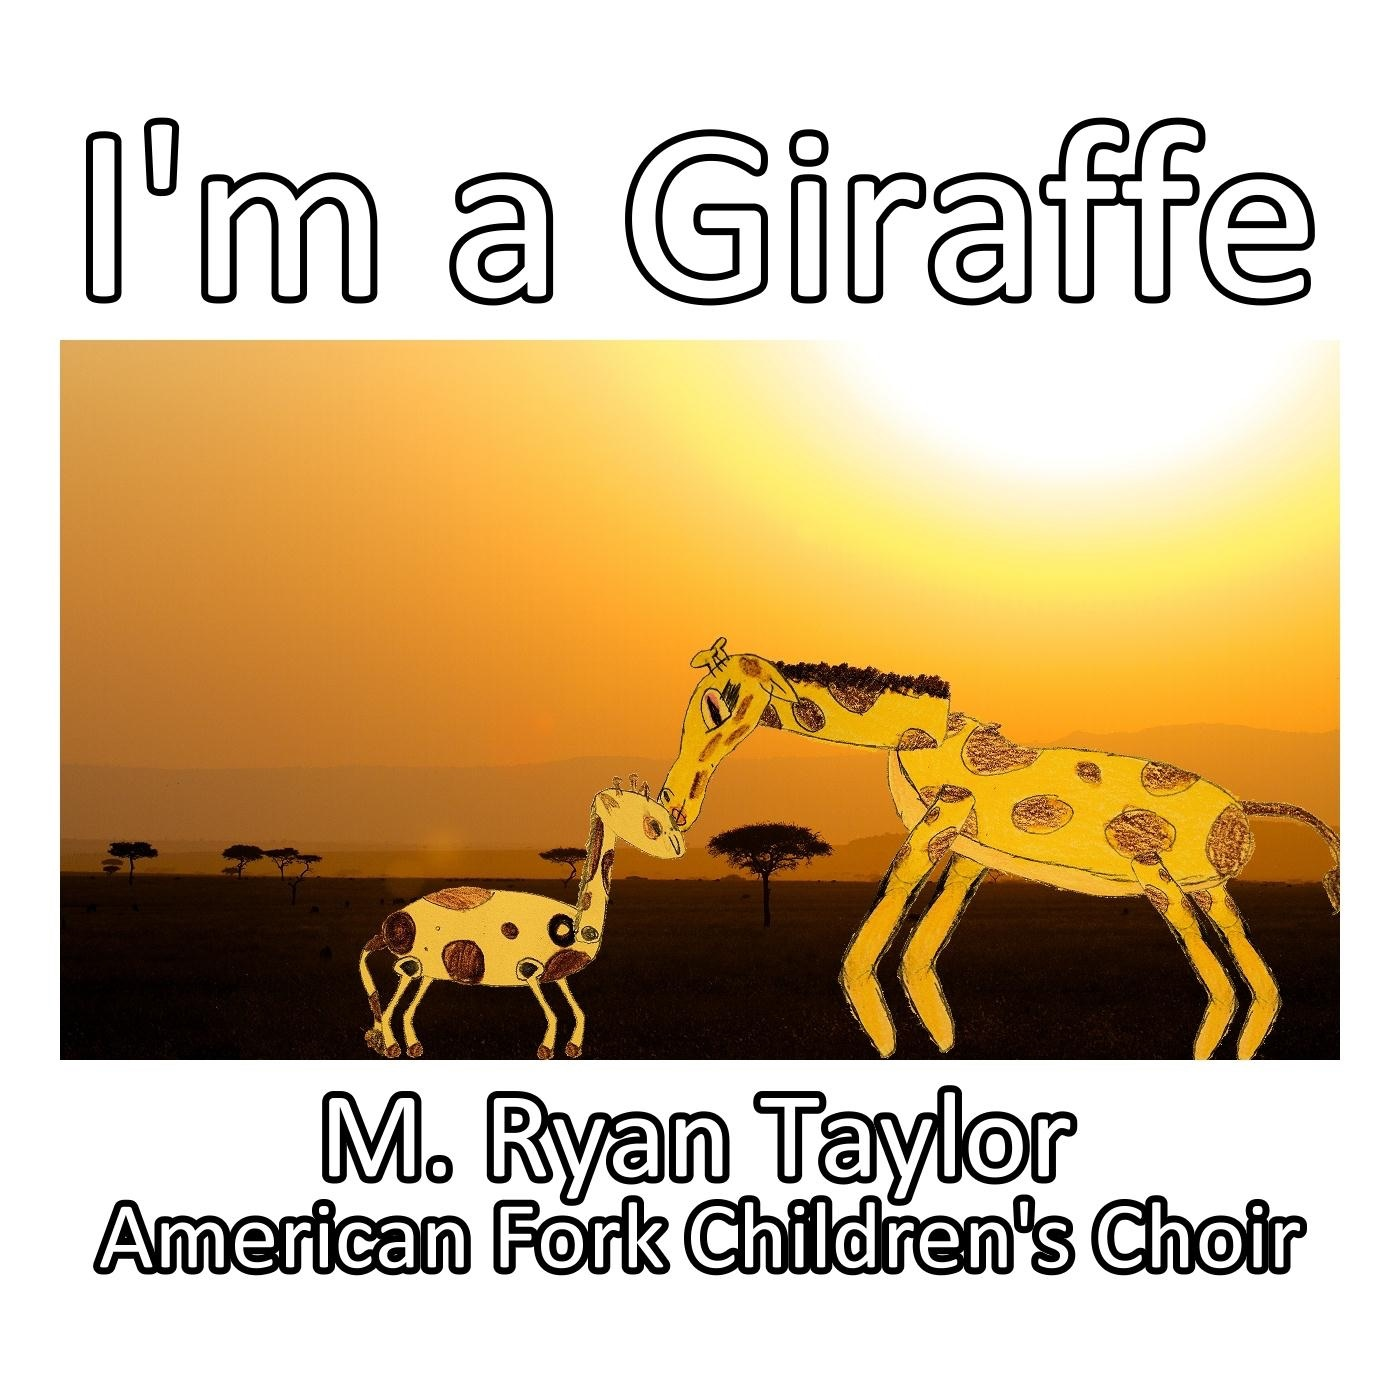 I'm a Giraffe (feat. The American Fork Children's Choir) - Single